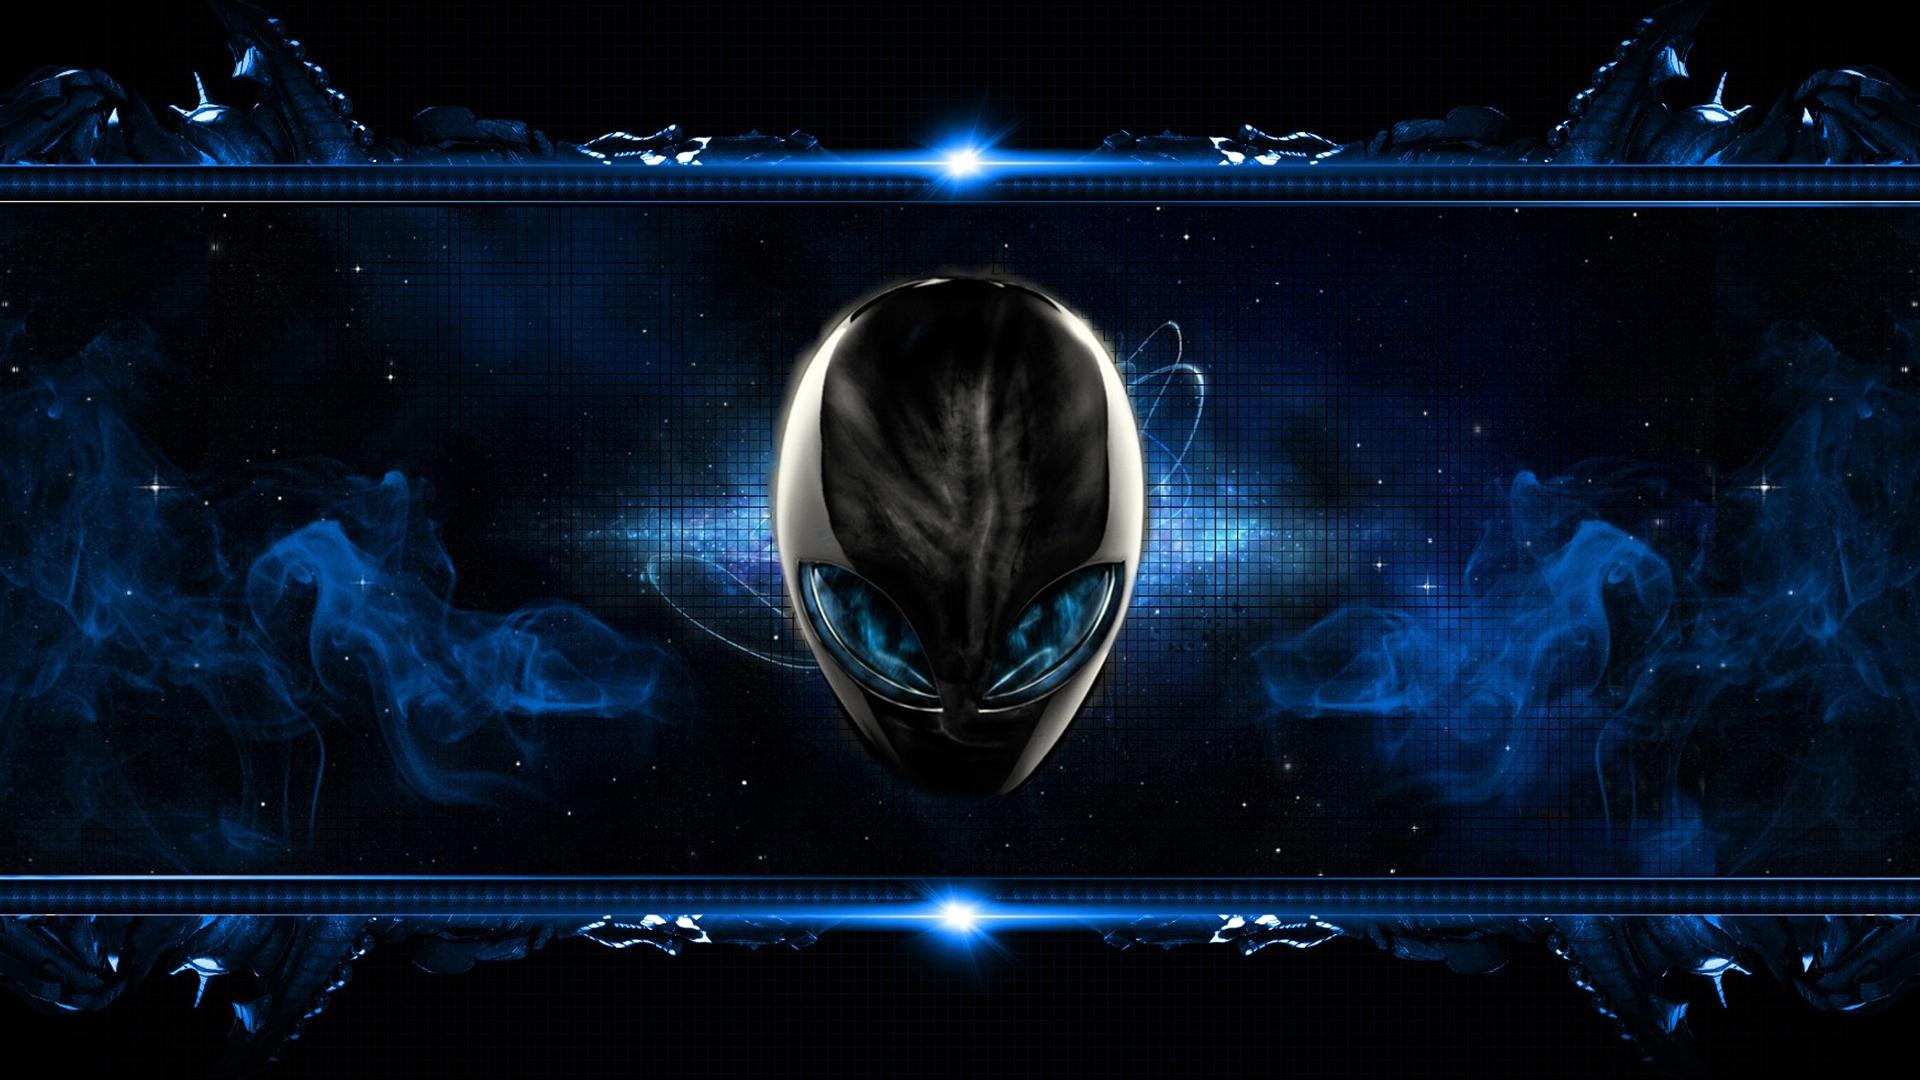 alienware logo smoky dark blue background 1920x1080 1080p wallpaper 1920x1080